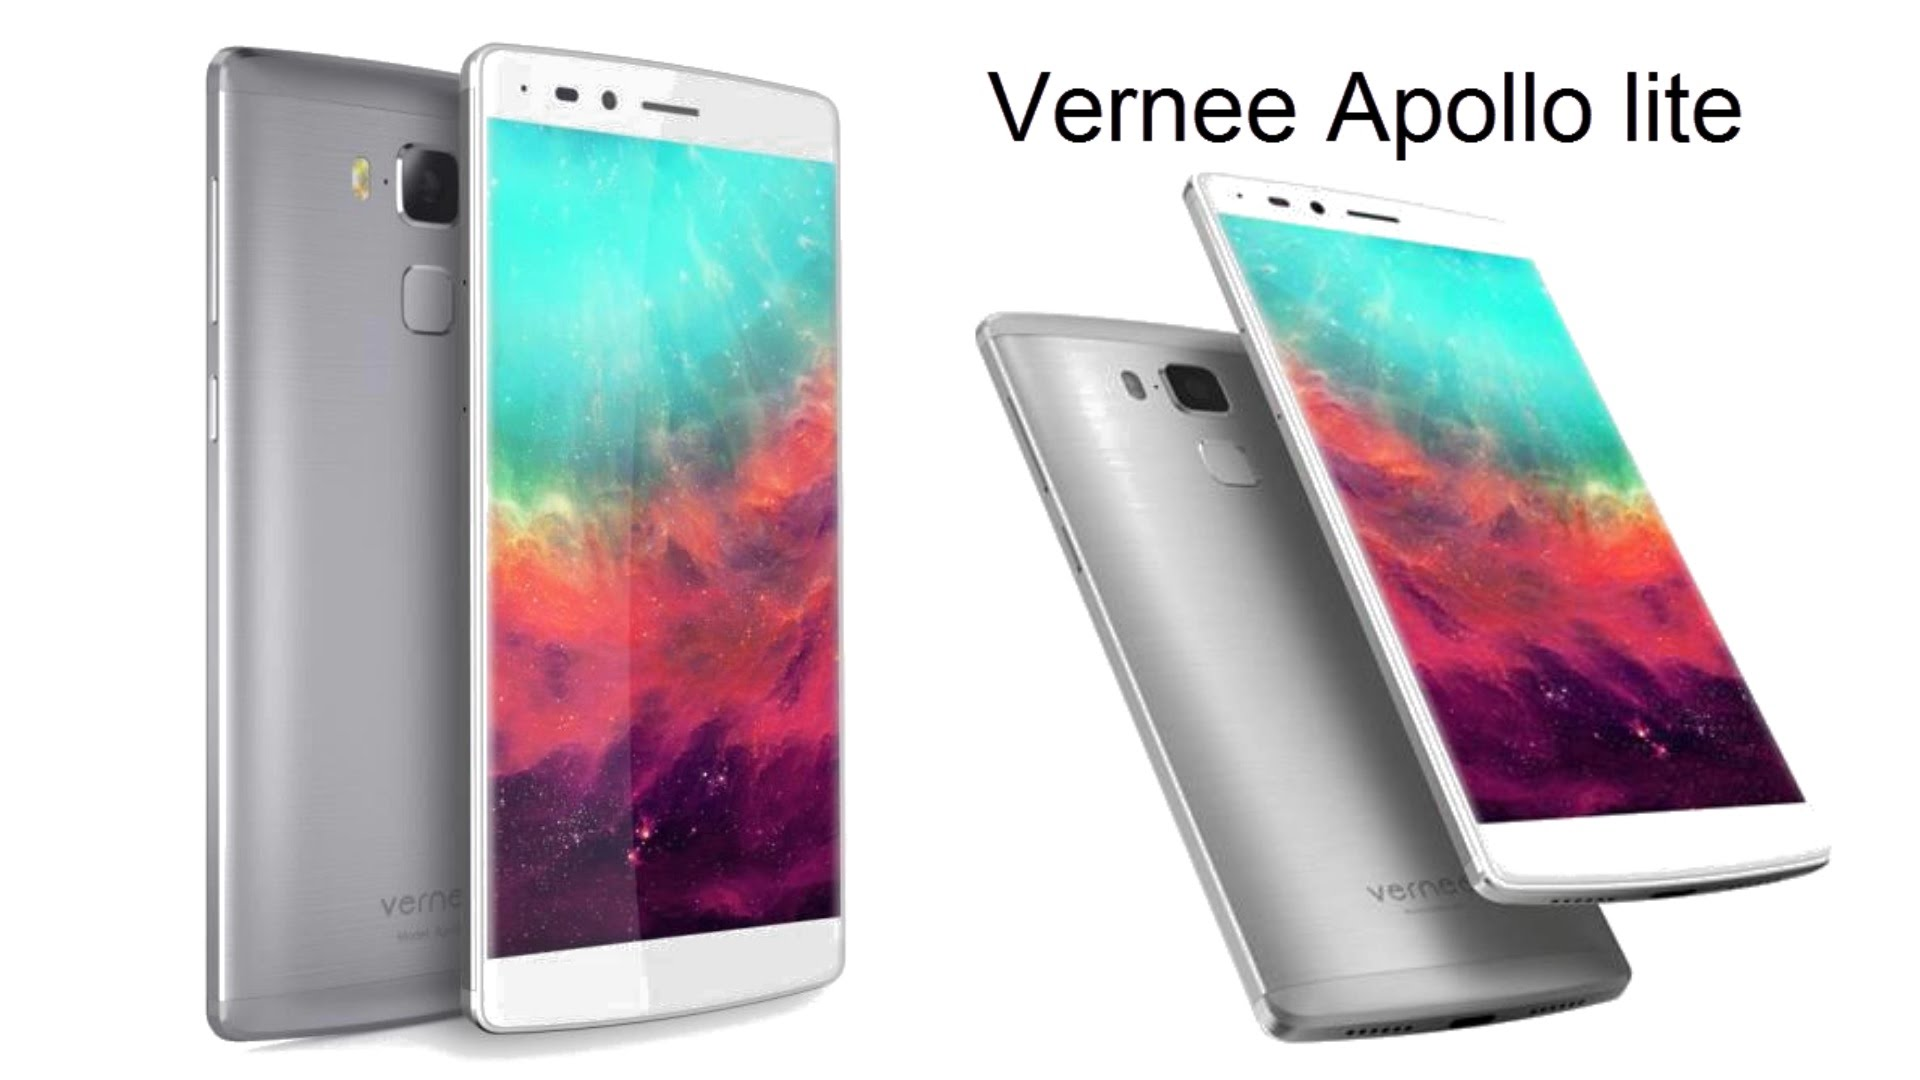 Vernee Apollo Lite – novodobý vítěz soutěže poměru cena/výkon/kvalita? [recenze]